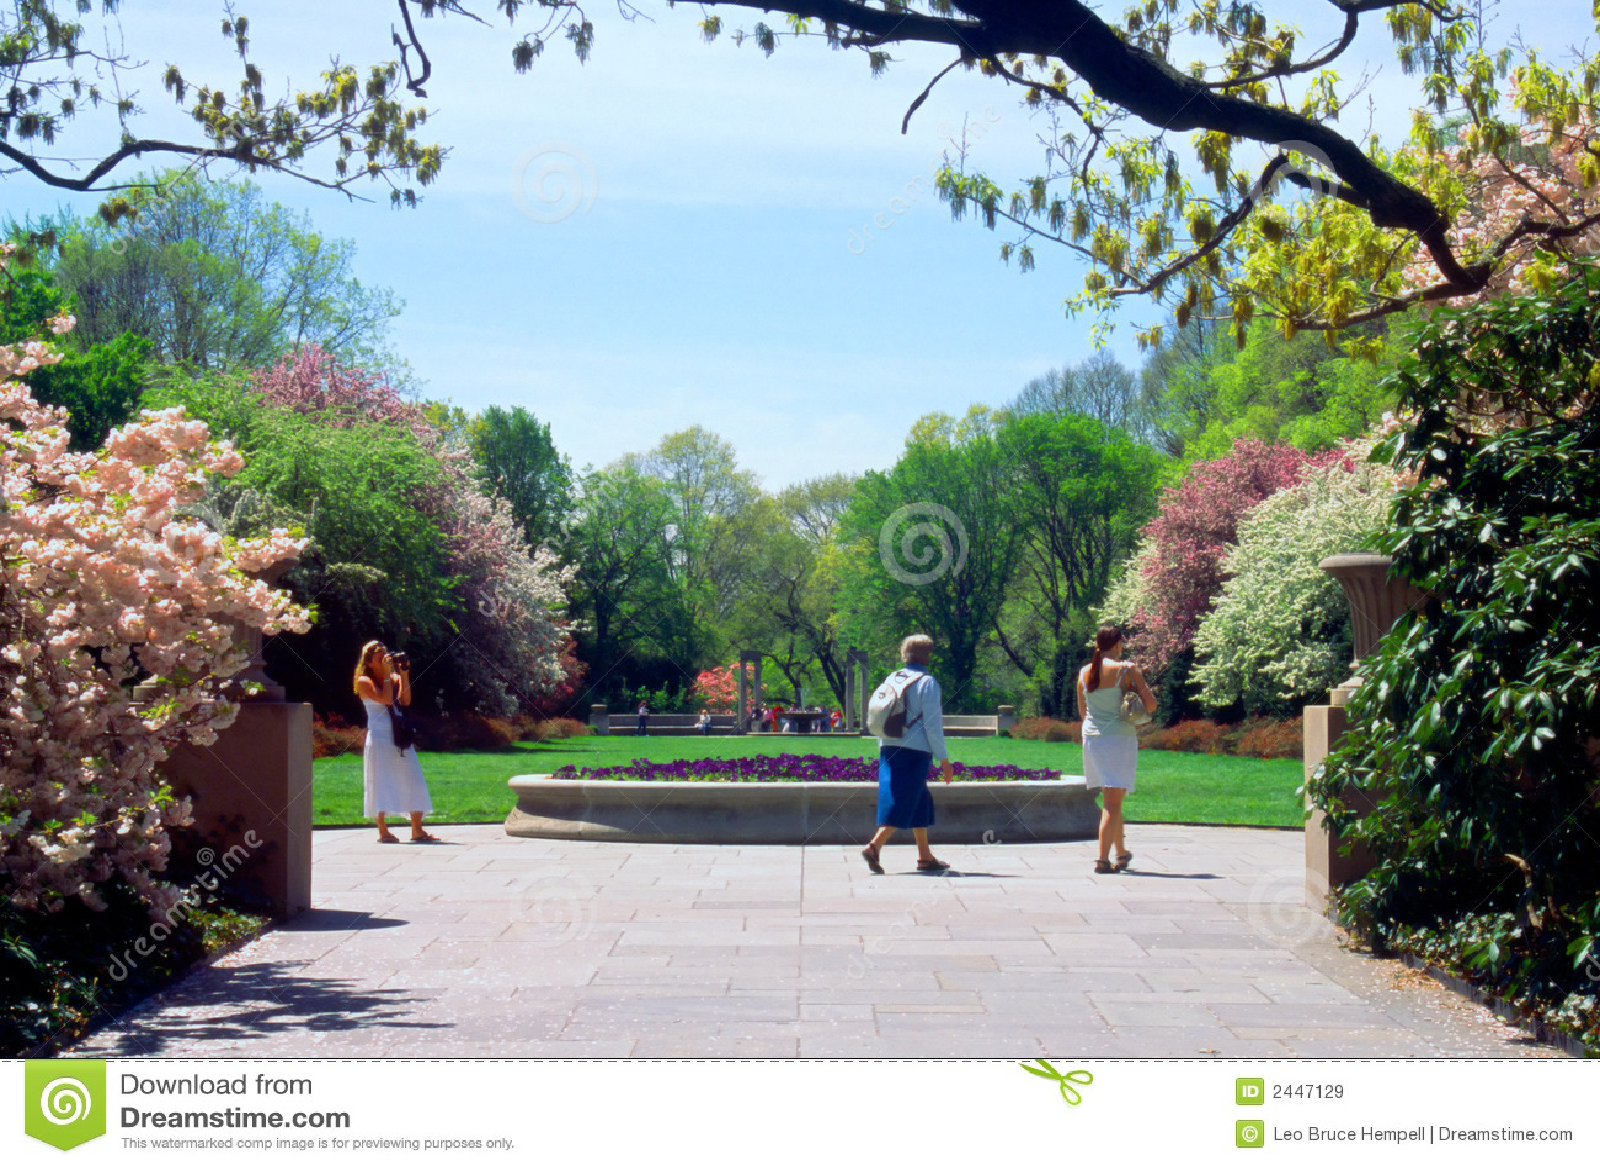 Tourists Brooklyn Botanic Garden New York Usa Stock Image Image 2447129